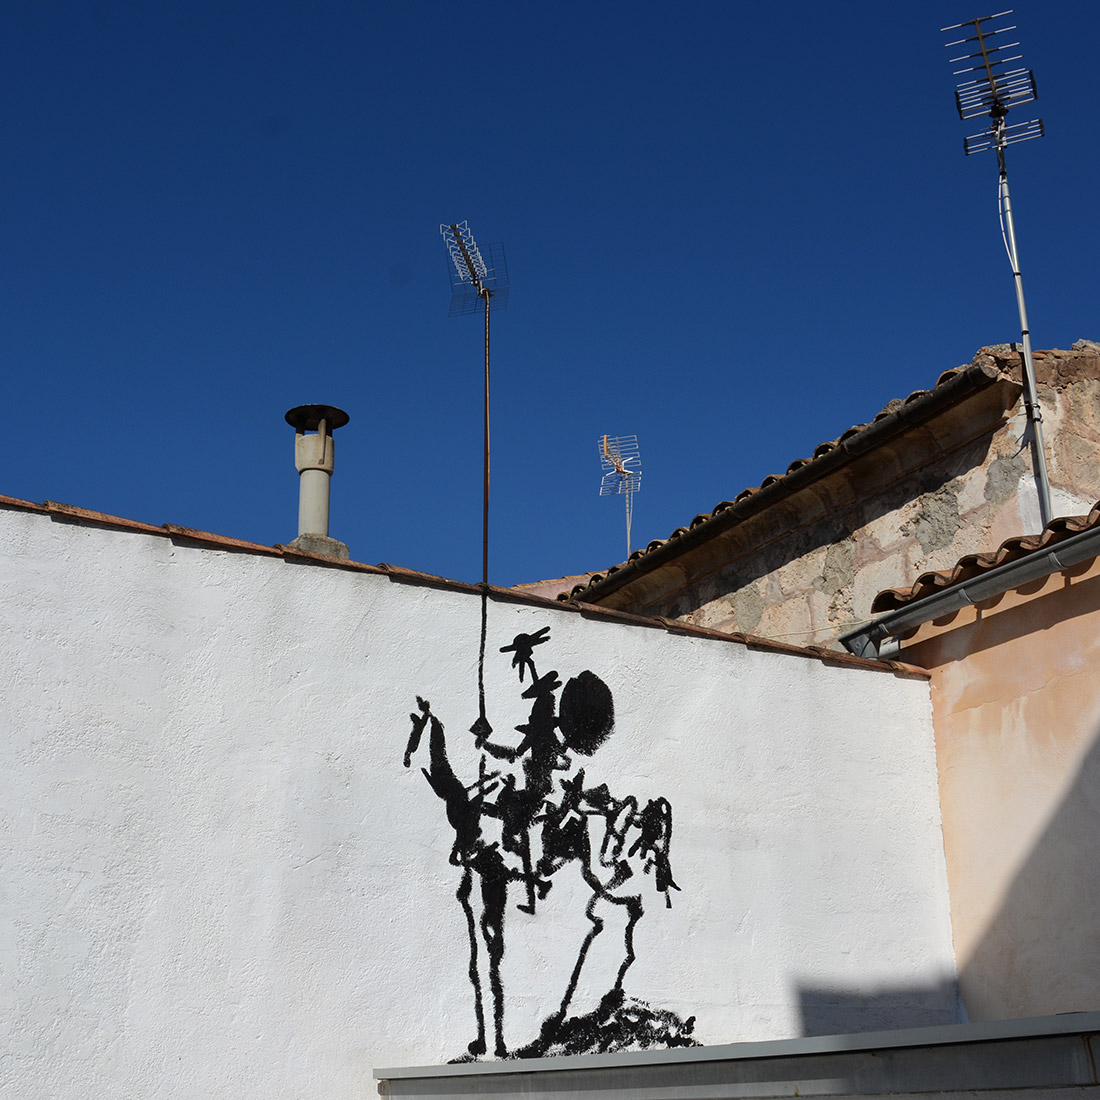 Don Quichotte - Mallorca - July 2017 by Oakoak